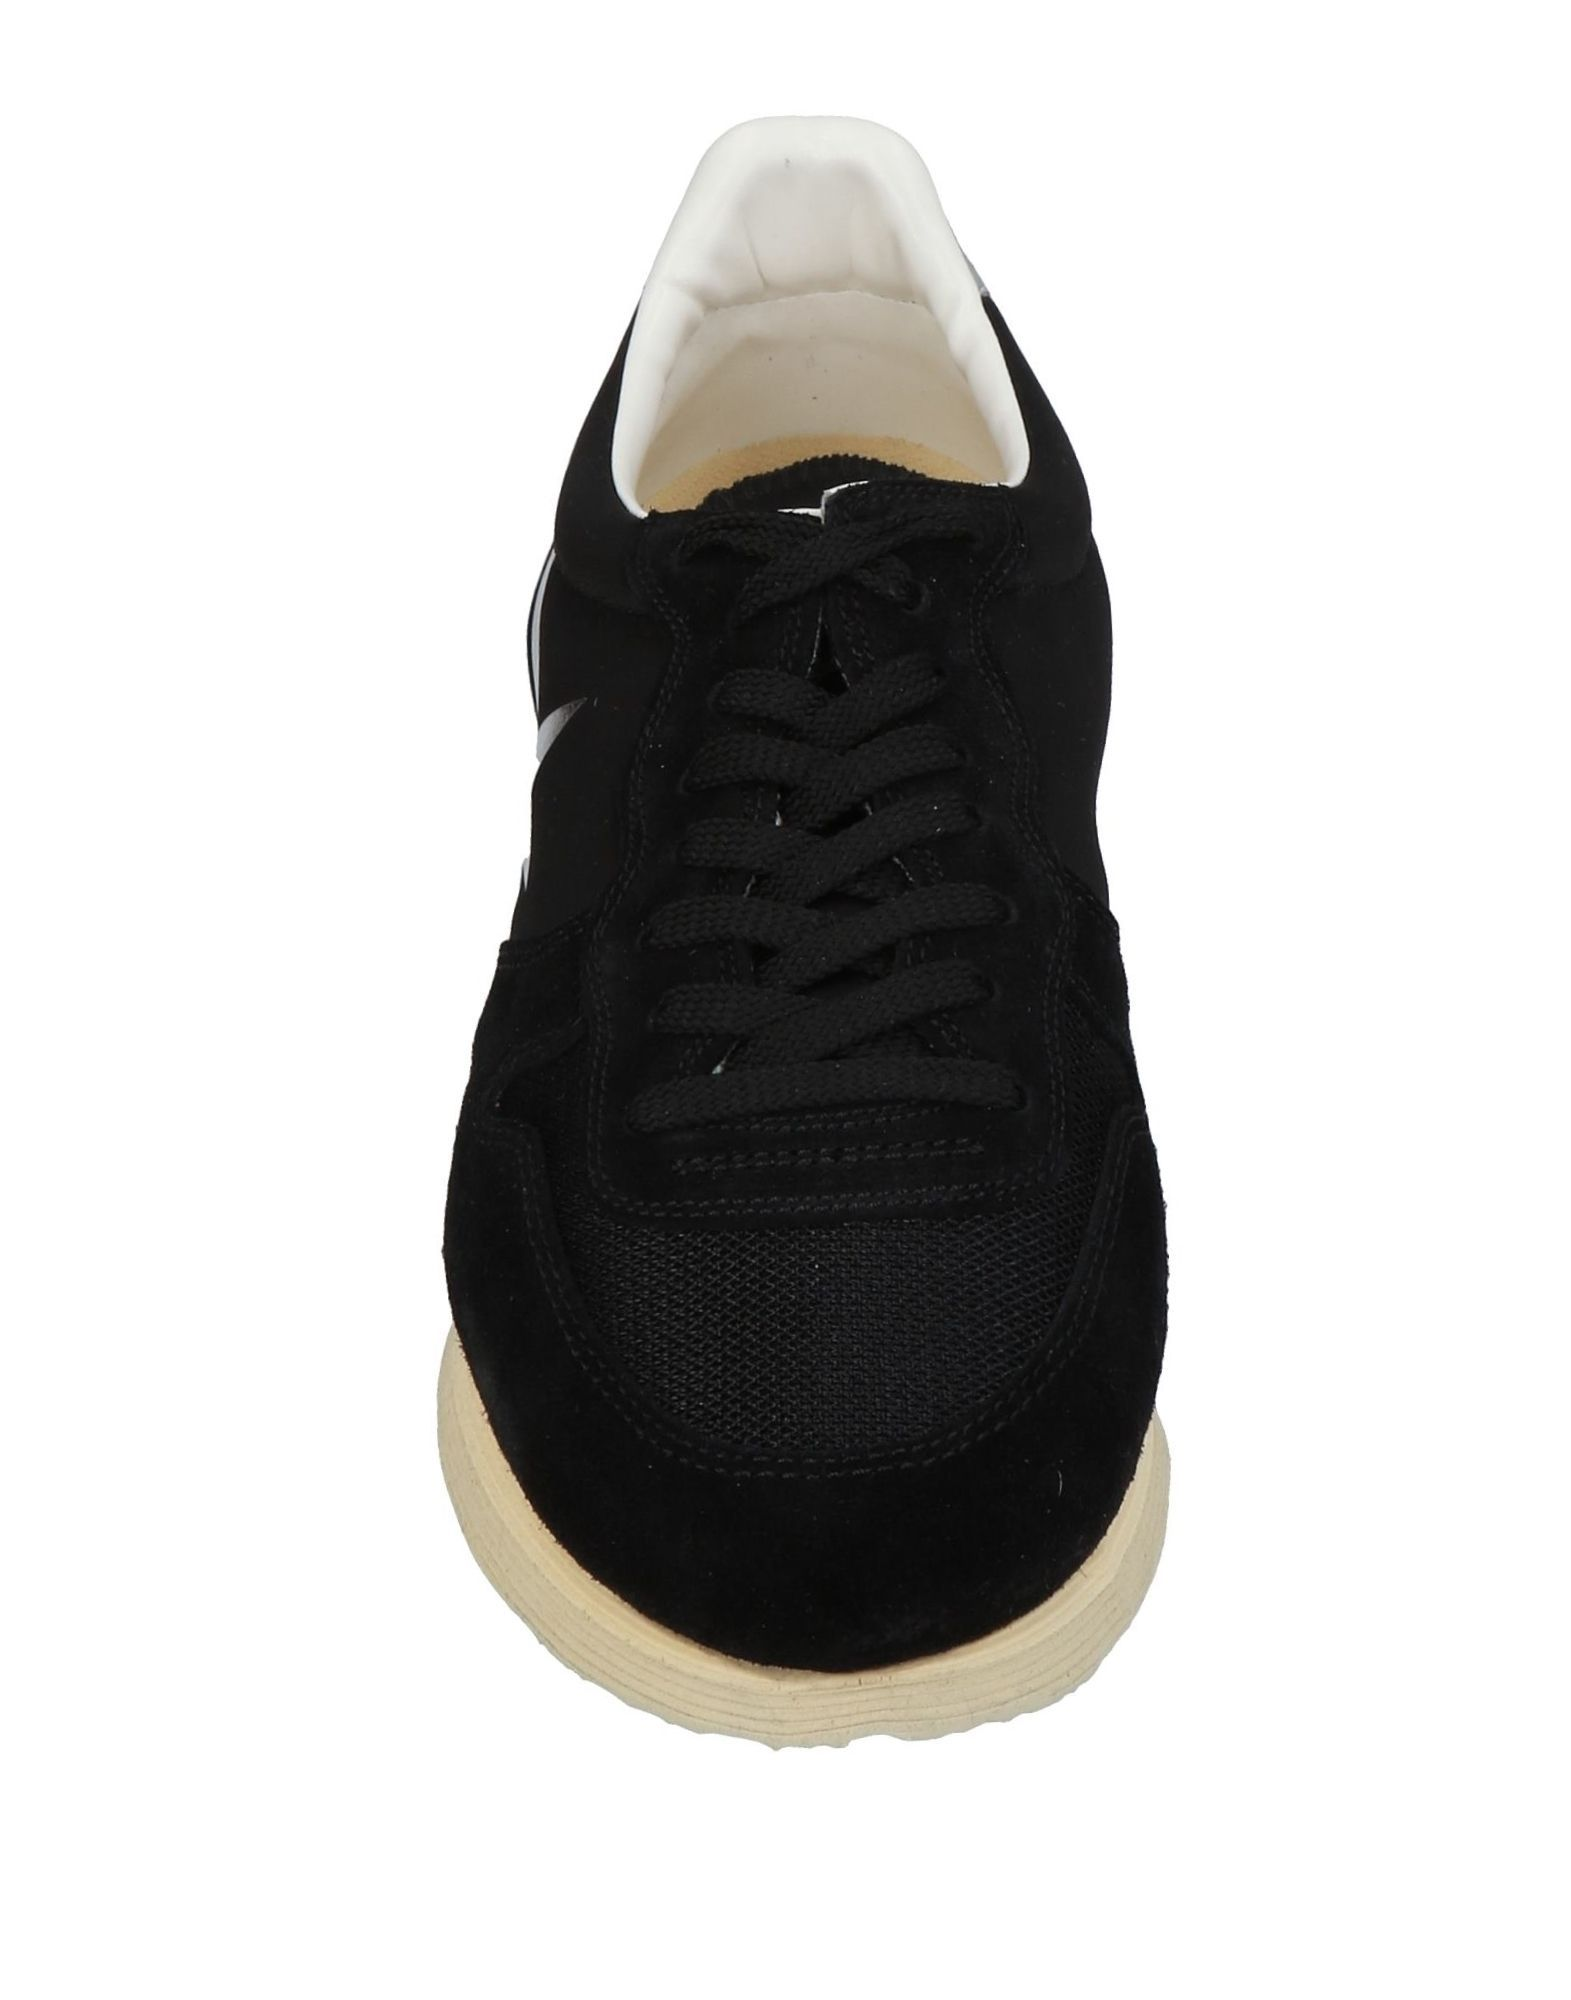 Haus Golden Goose Black Leather Sneakers